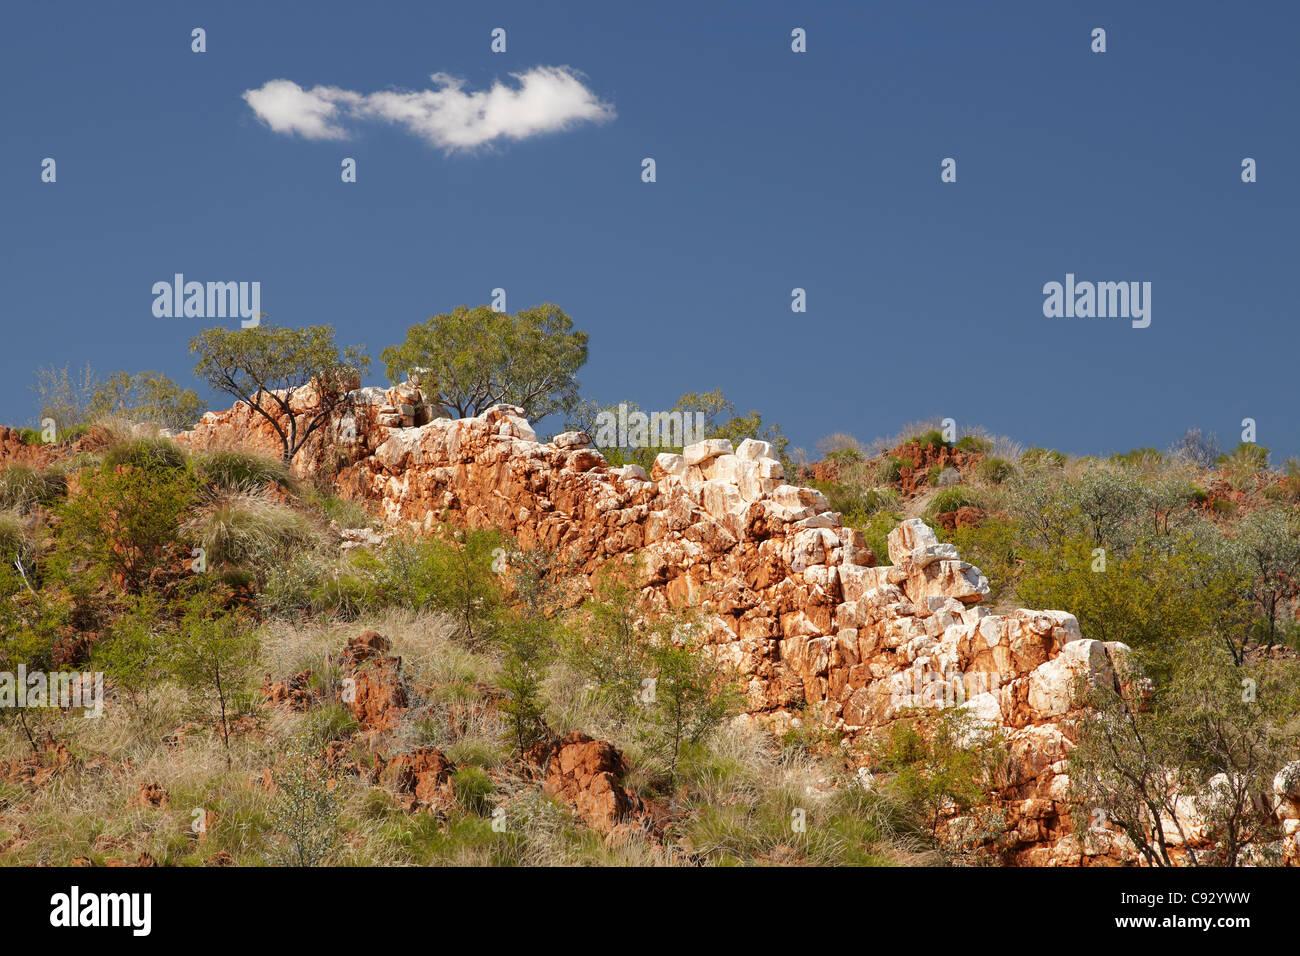 China Wall (vein of quartz rock), near Halls Creek, Kimberley Region, Western Australia, Australia - Stock Image